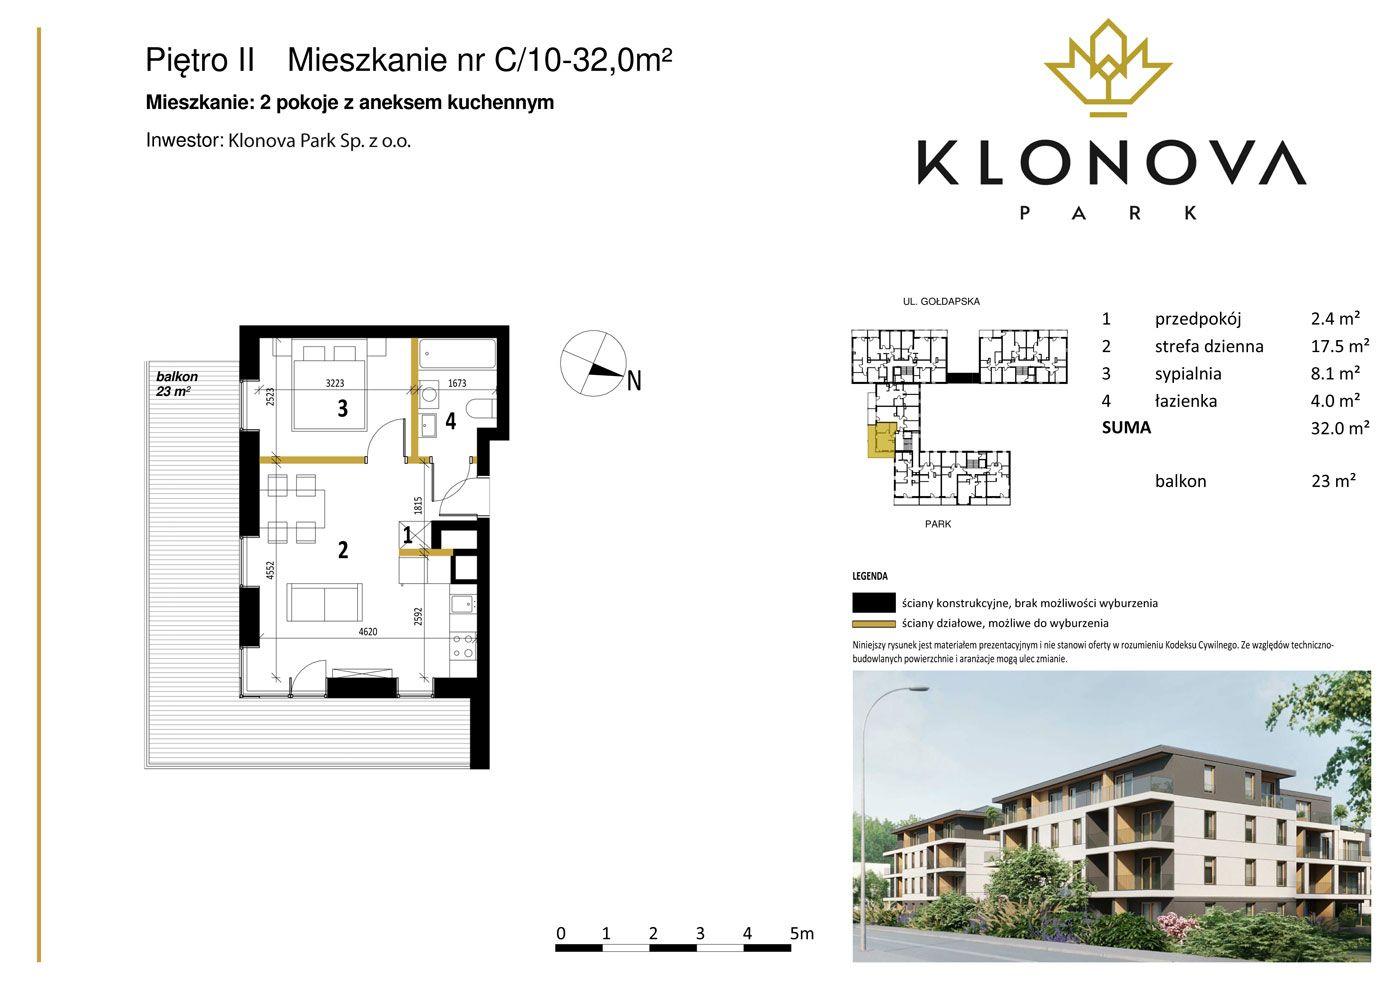 Apartamenty Klonova Park - Plan mieszkania C/10